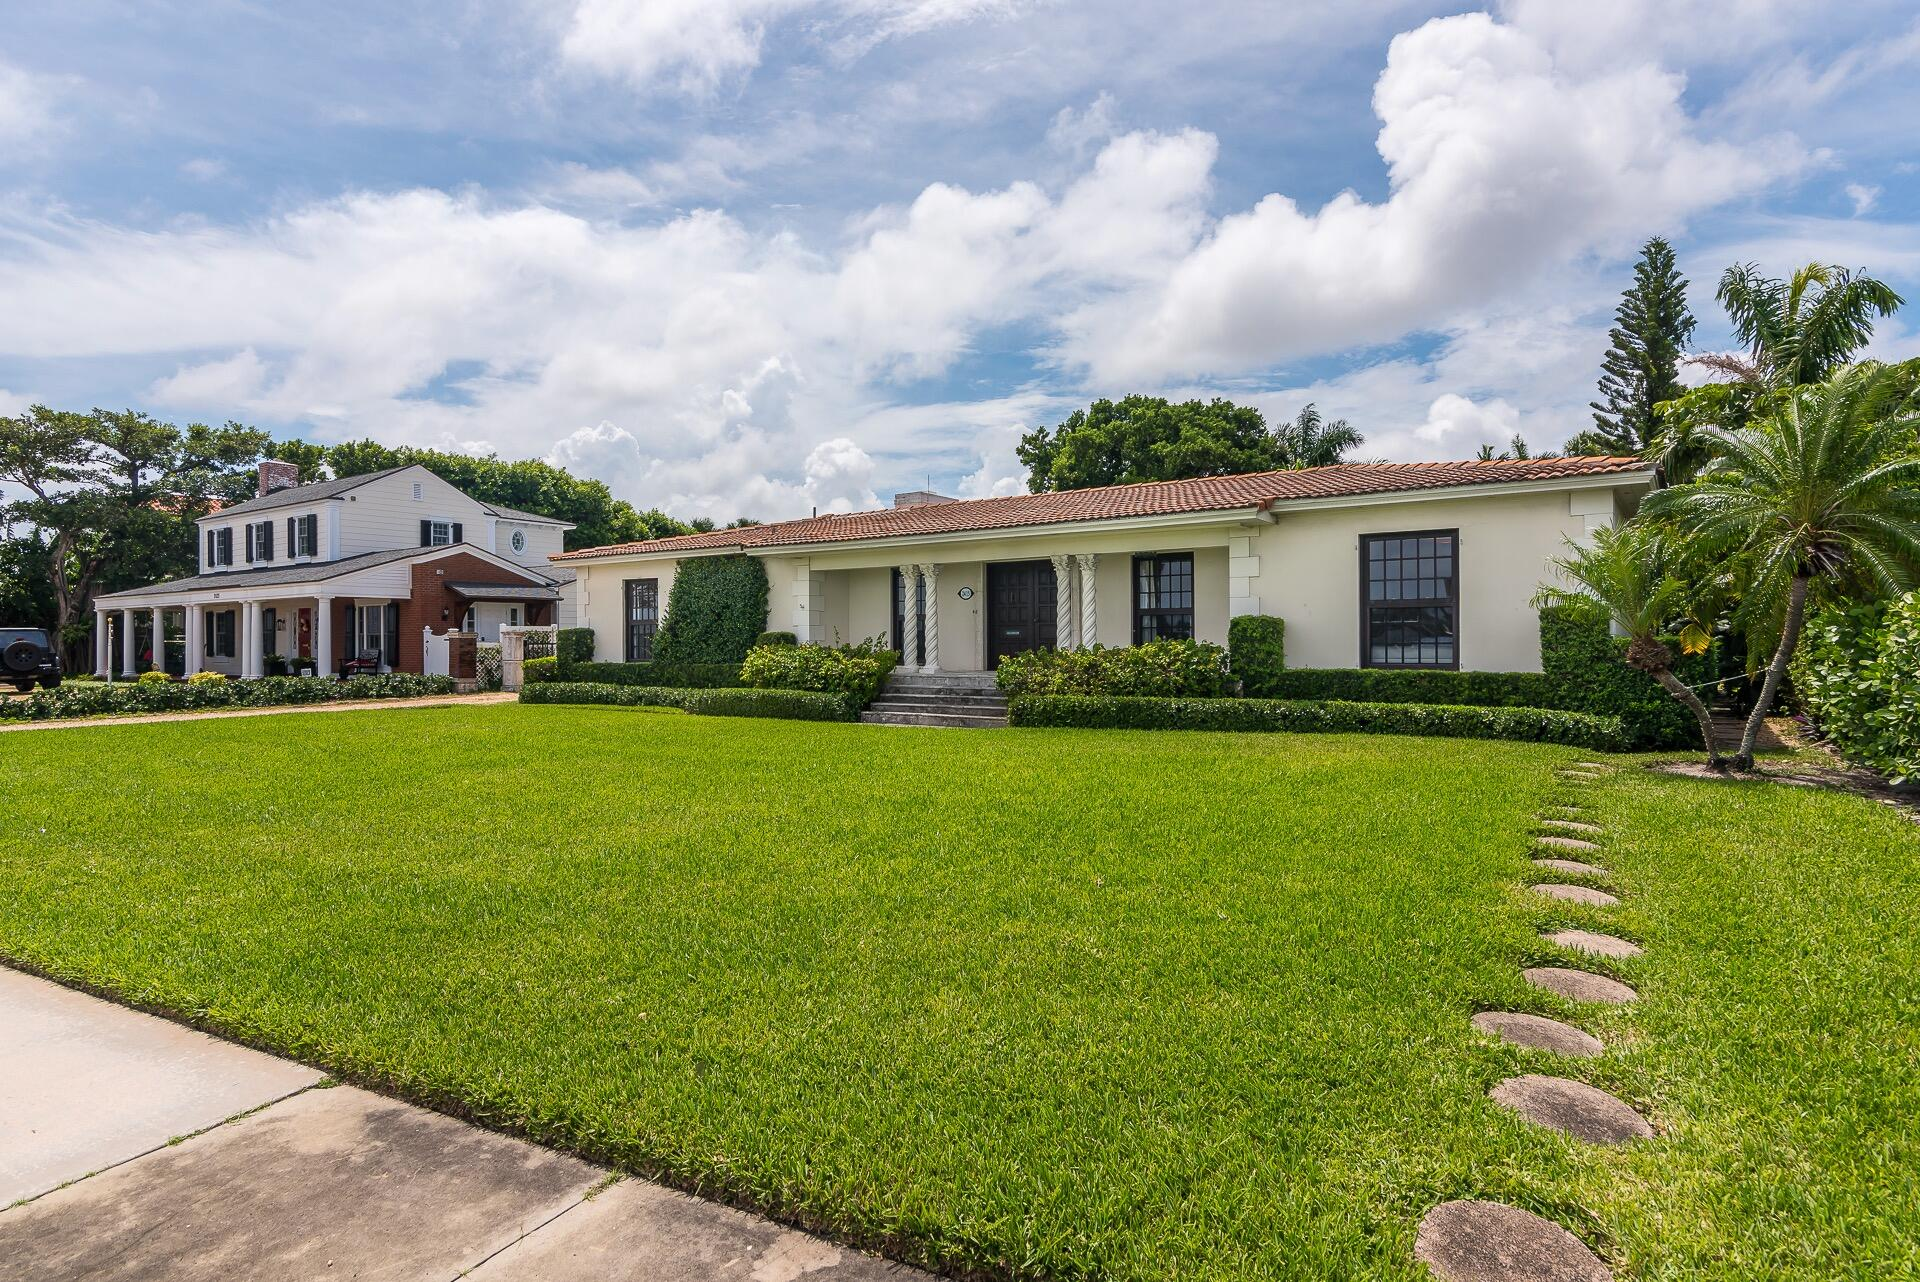 2415 Flagler, West Palm Beach, Florida 33401